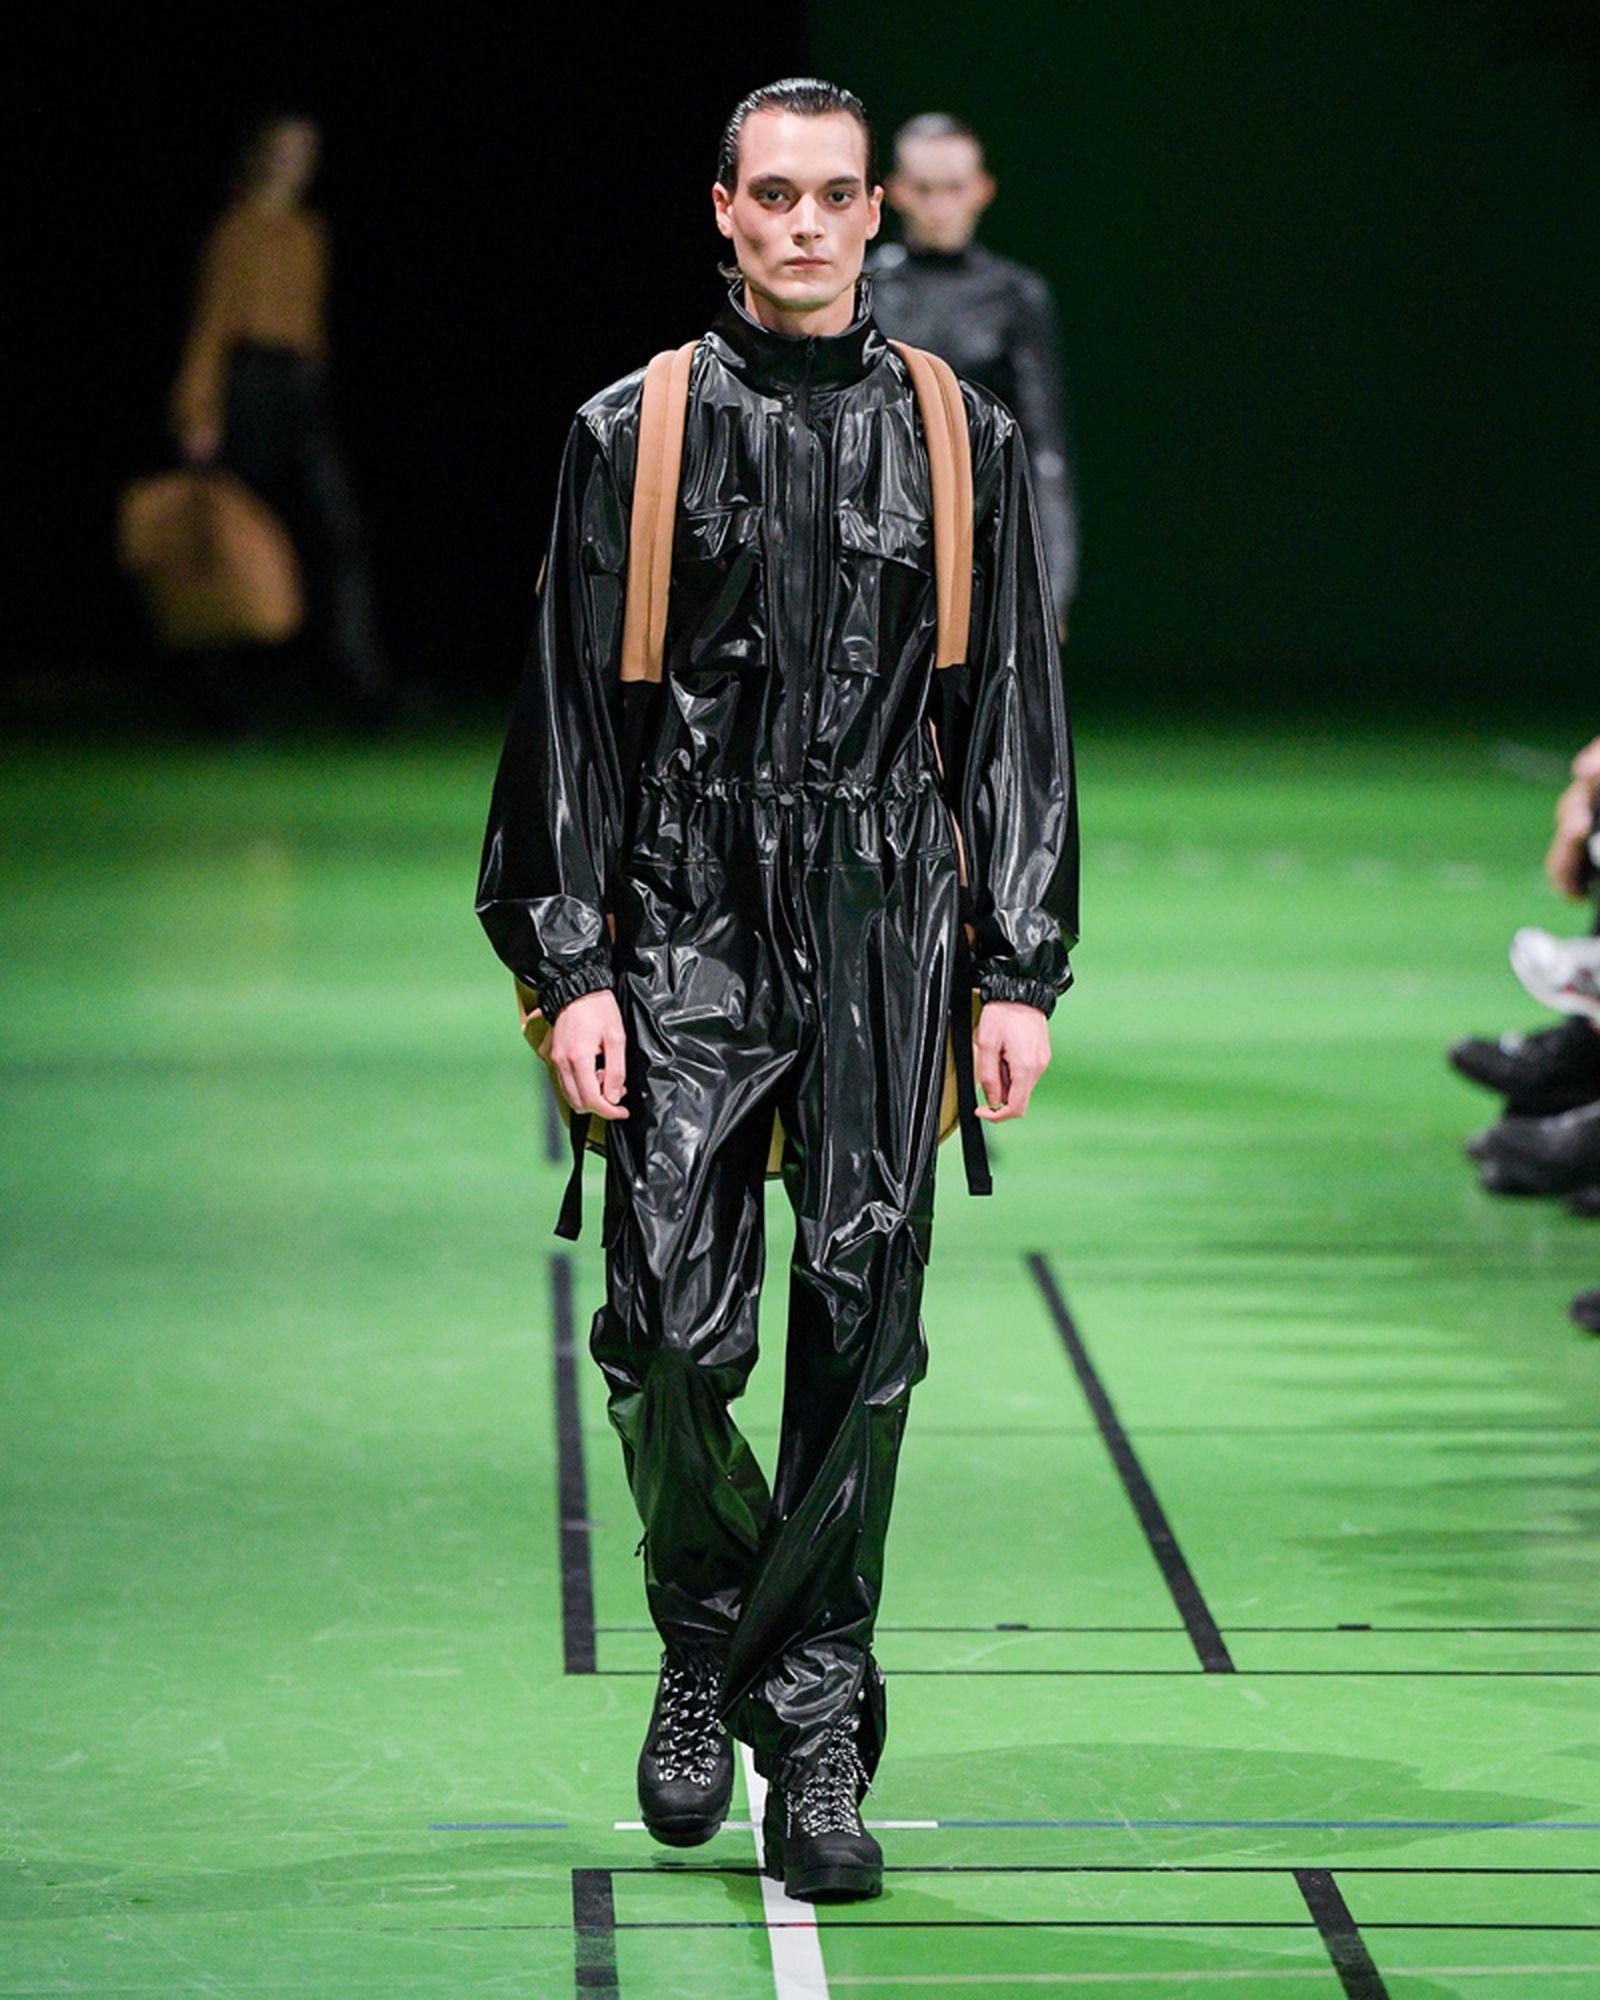 future-fashion-week-copenhagen-rains-8